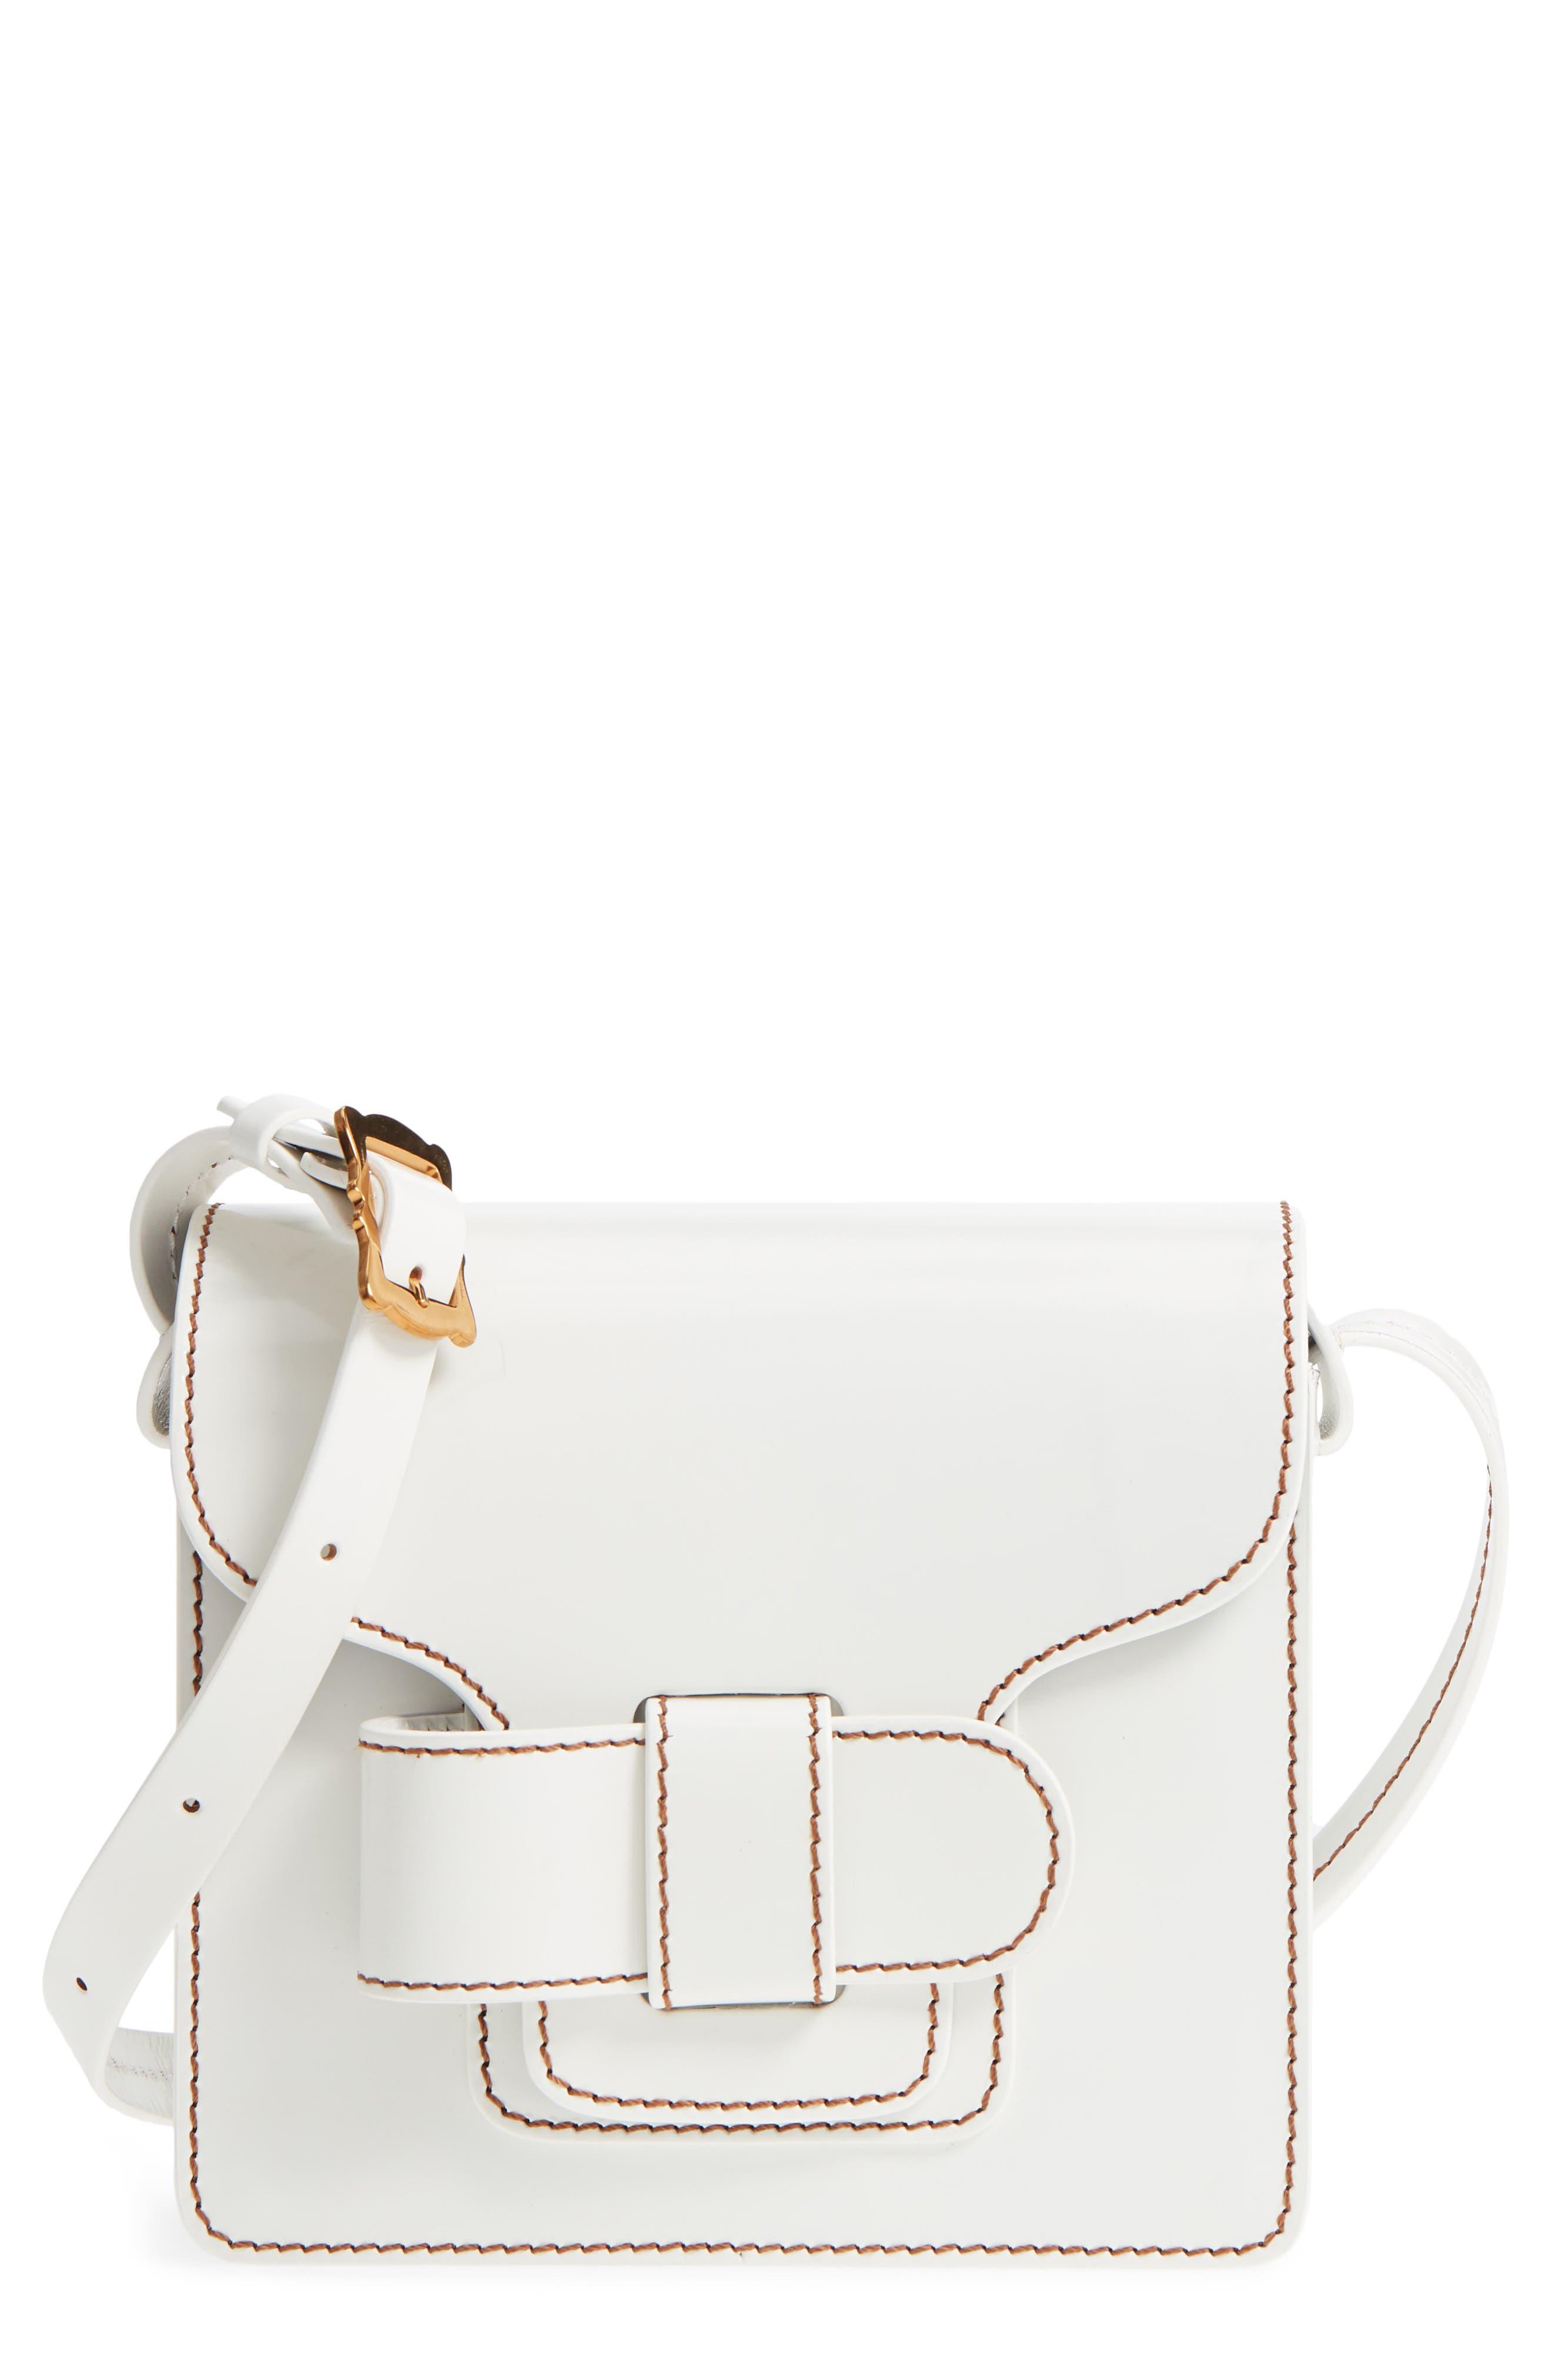 TRADEMARK Greta Leather Crossbody Bag